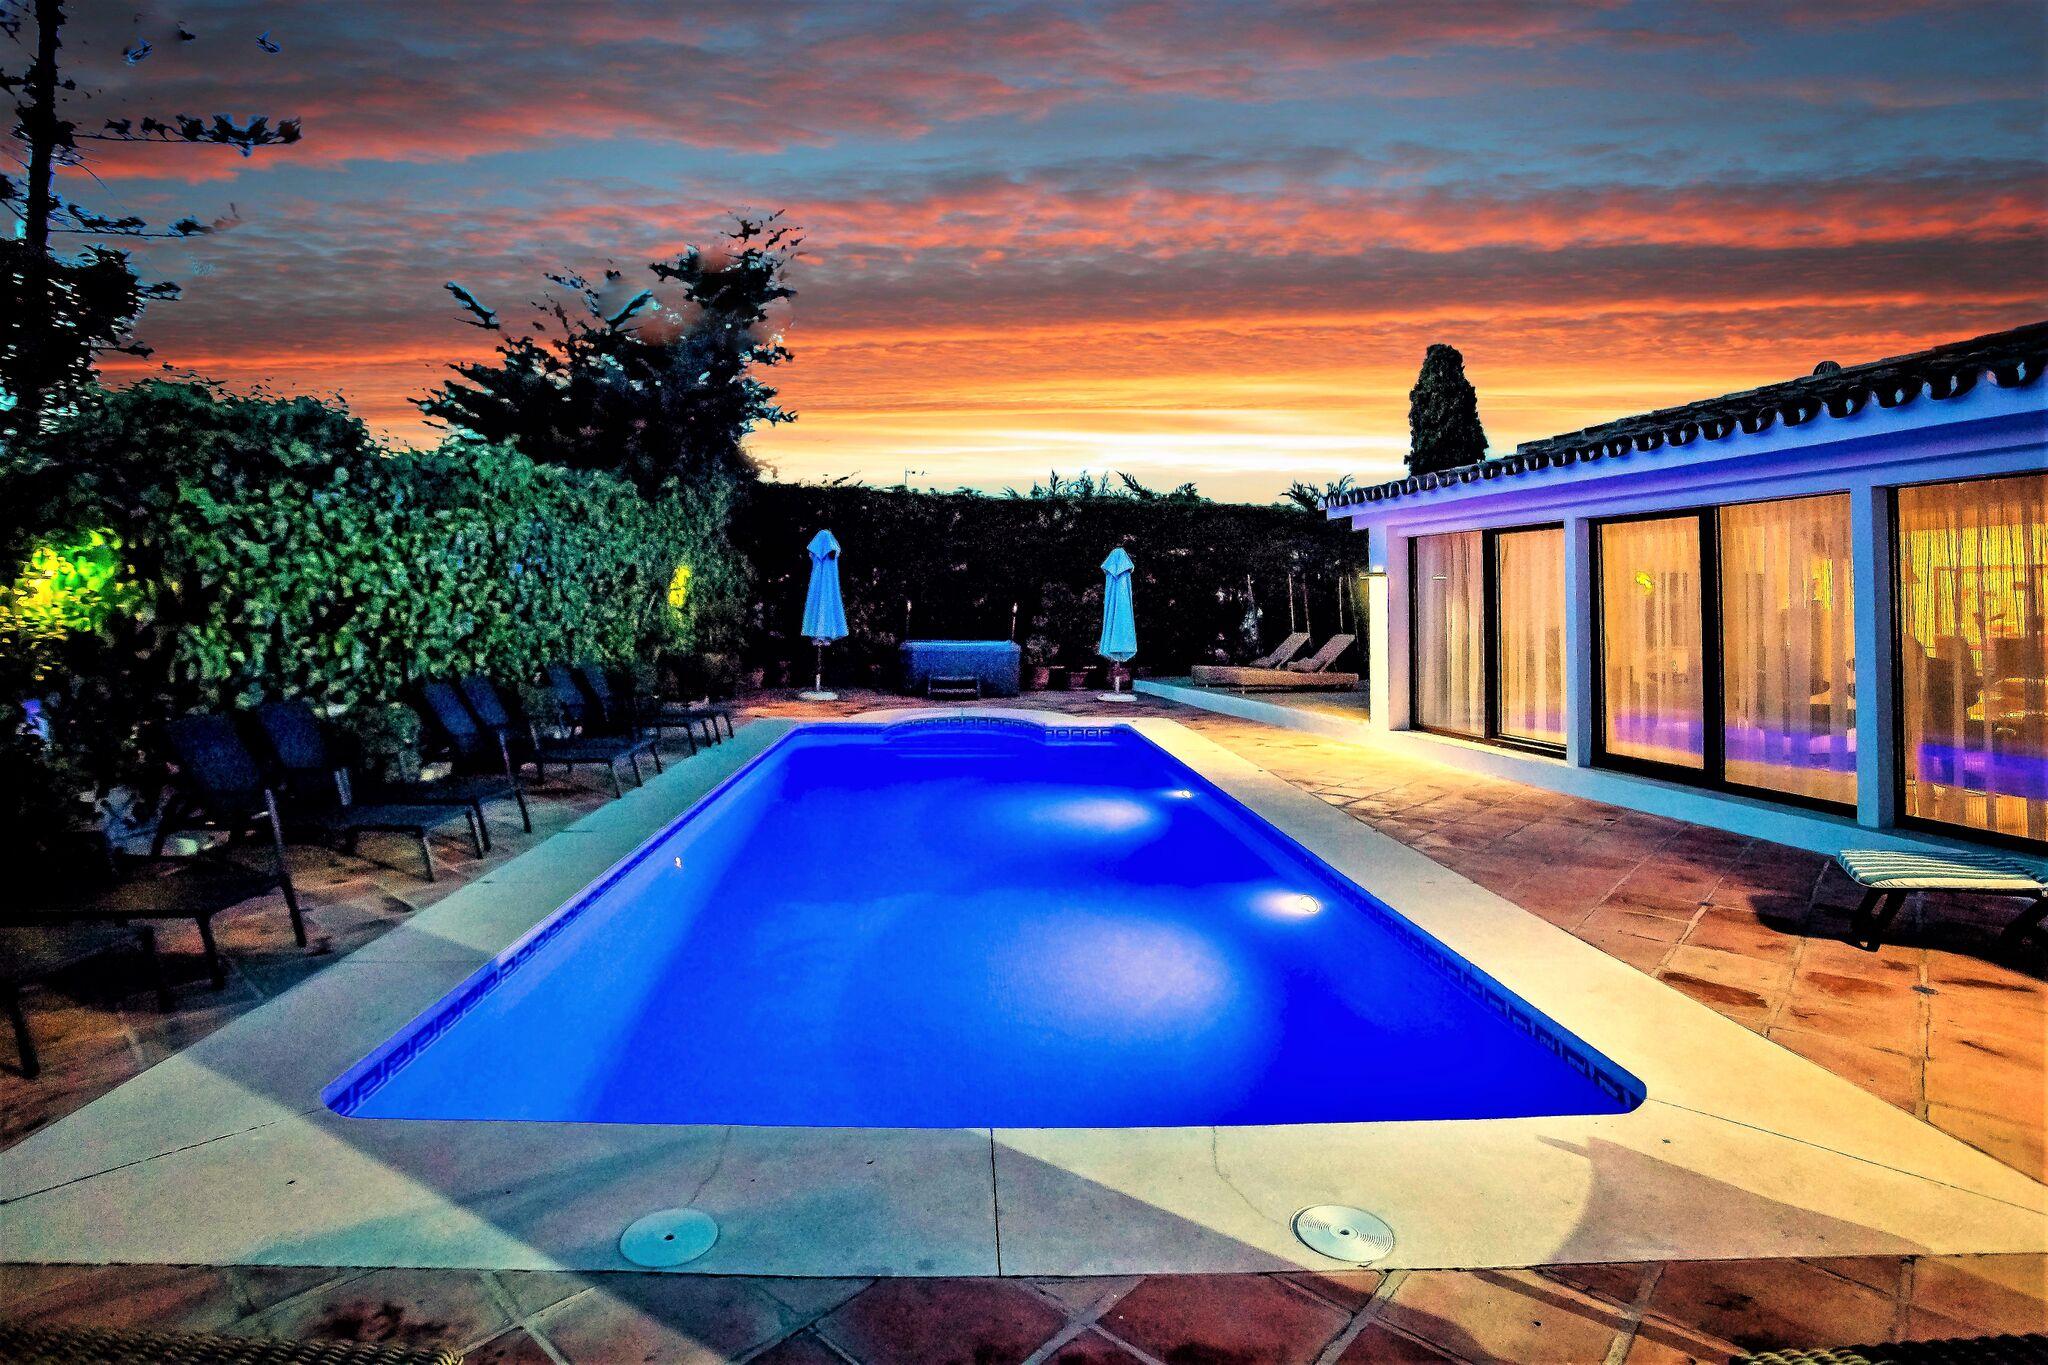 Apartment 8 Bedroom VILLA BY PUERTO BANUS   SEA 5 min                                photo 16956490